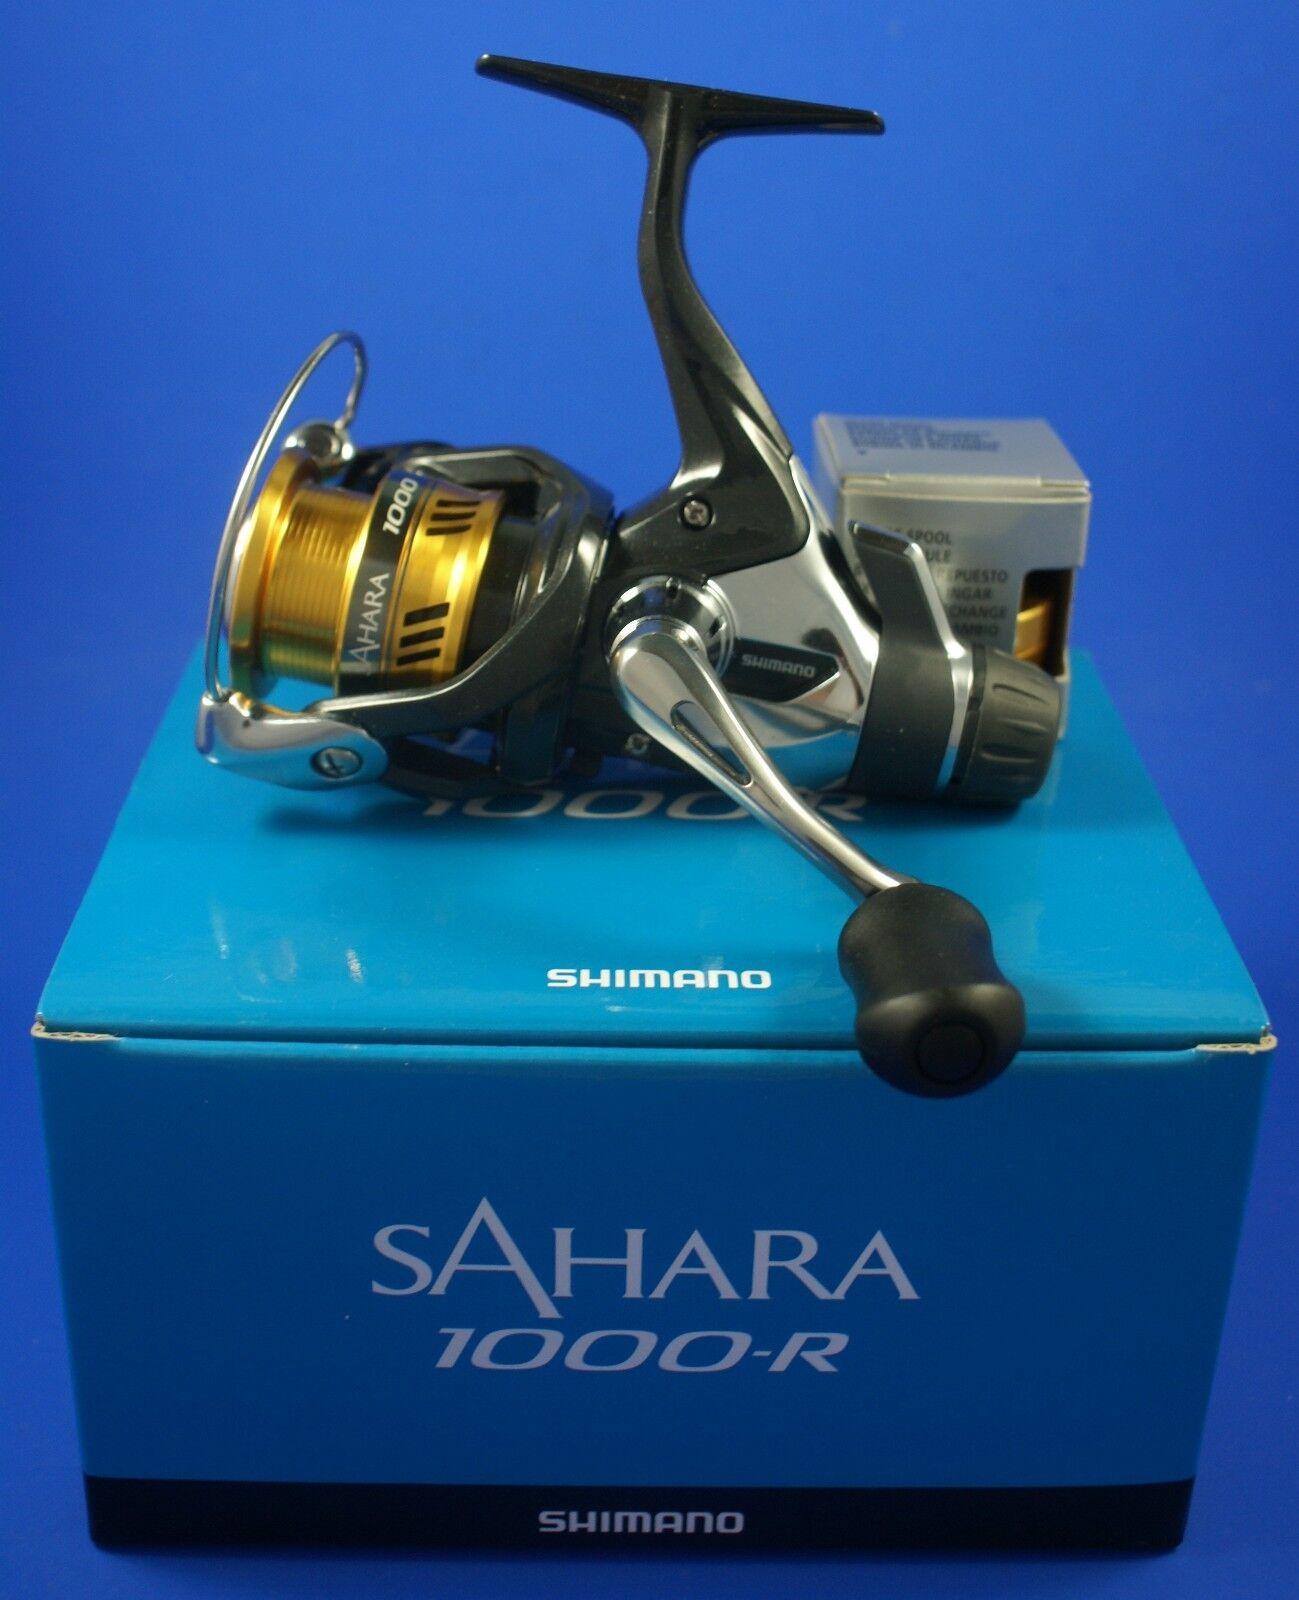 Shimano Sahara 1000 R    SH1000-R    Trasero Arrastre Reel De Pesca